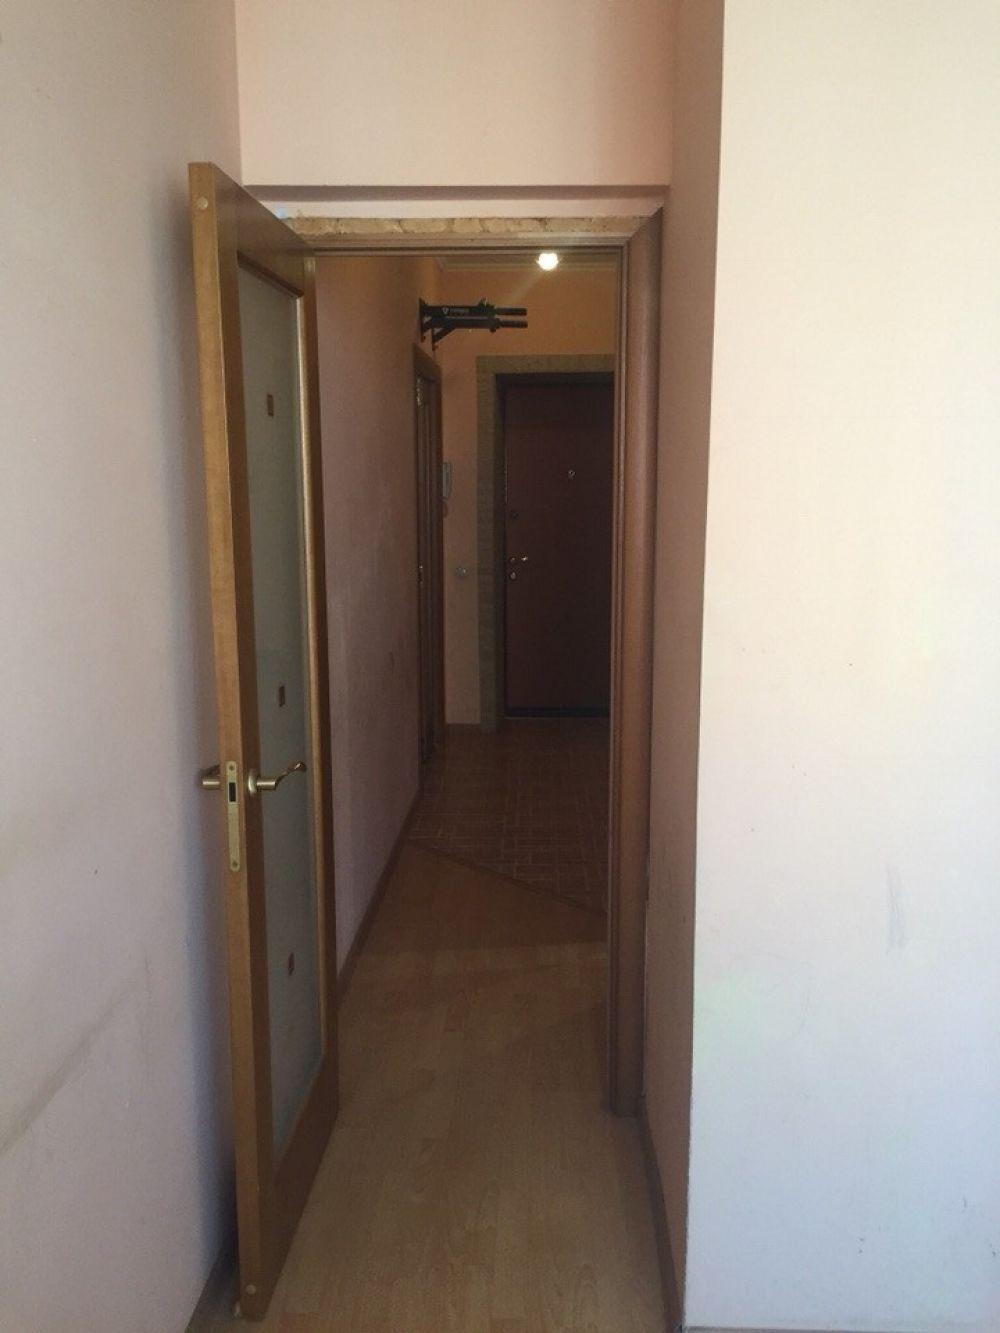 Однокомнатная квартира, 42 м2, Щёлково, ул 8 Марта, 11, фото 5